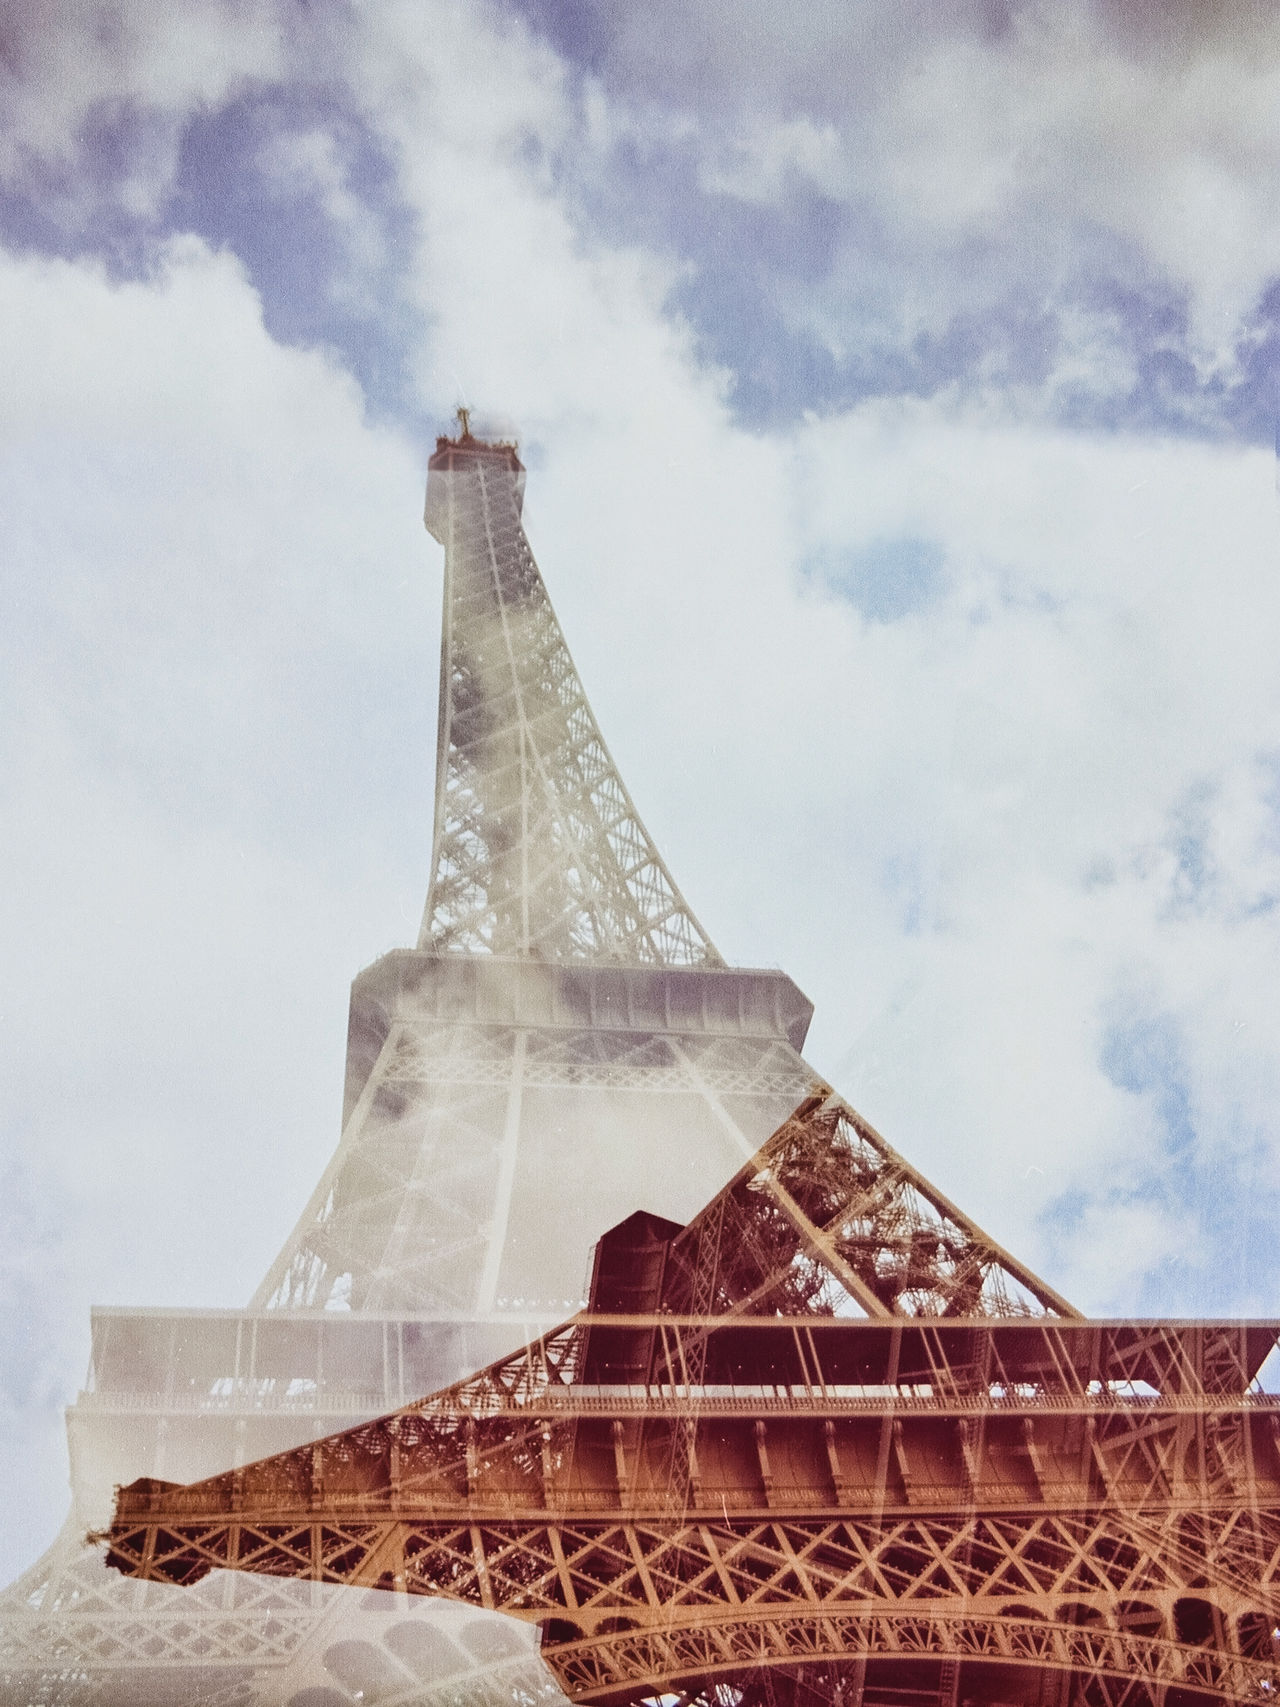 35 Mm Film Look 35film 35mm Film Architecture Eiffel Tower Famous Place International Landmark Tall - High Tour Eiffel Tower